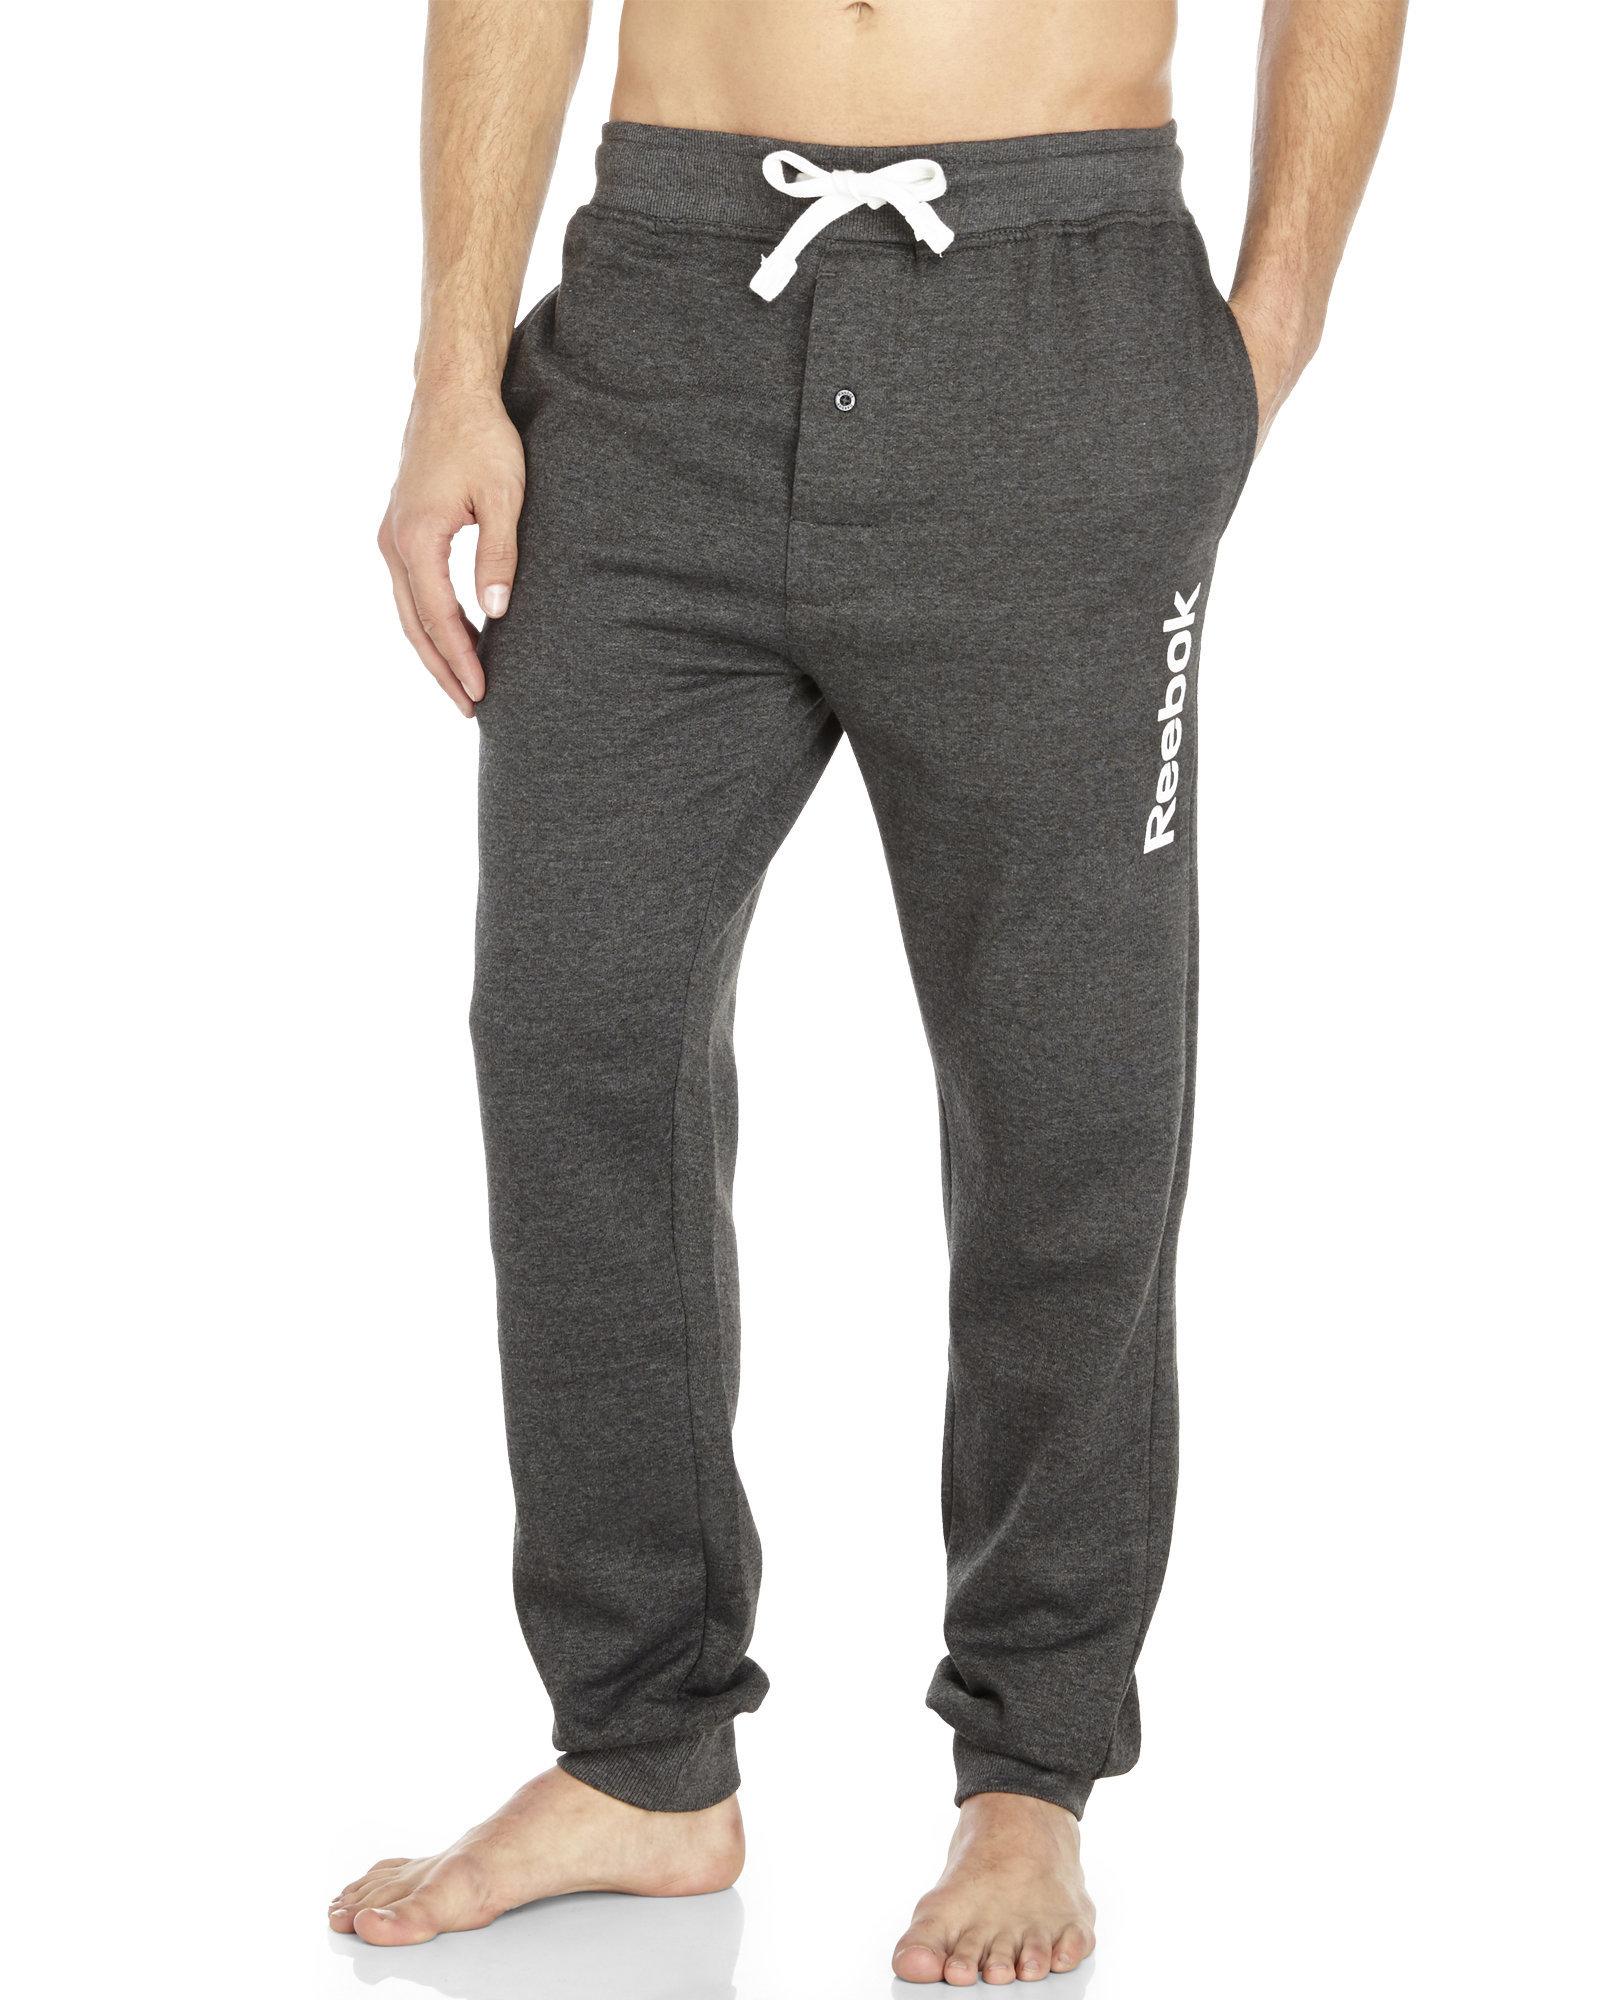 Reebok Men/'s Knit Lounge Pants Light Charcoal Heather M